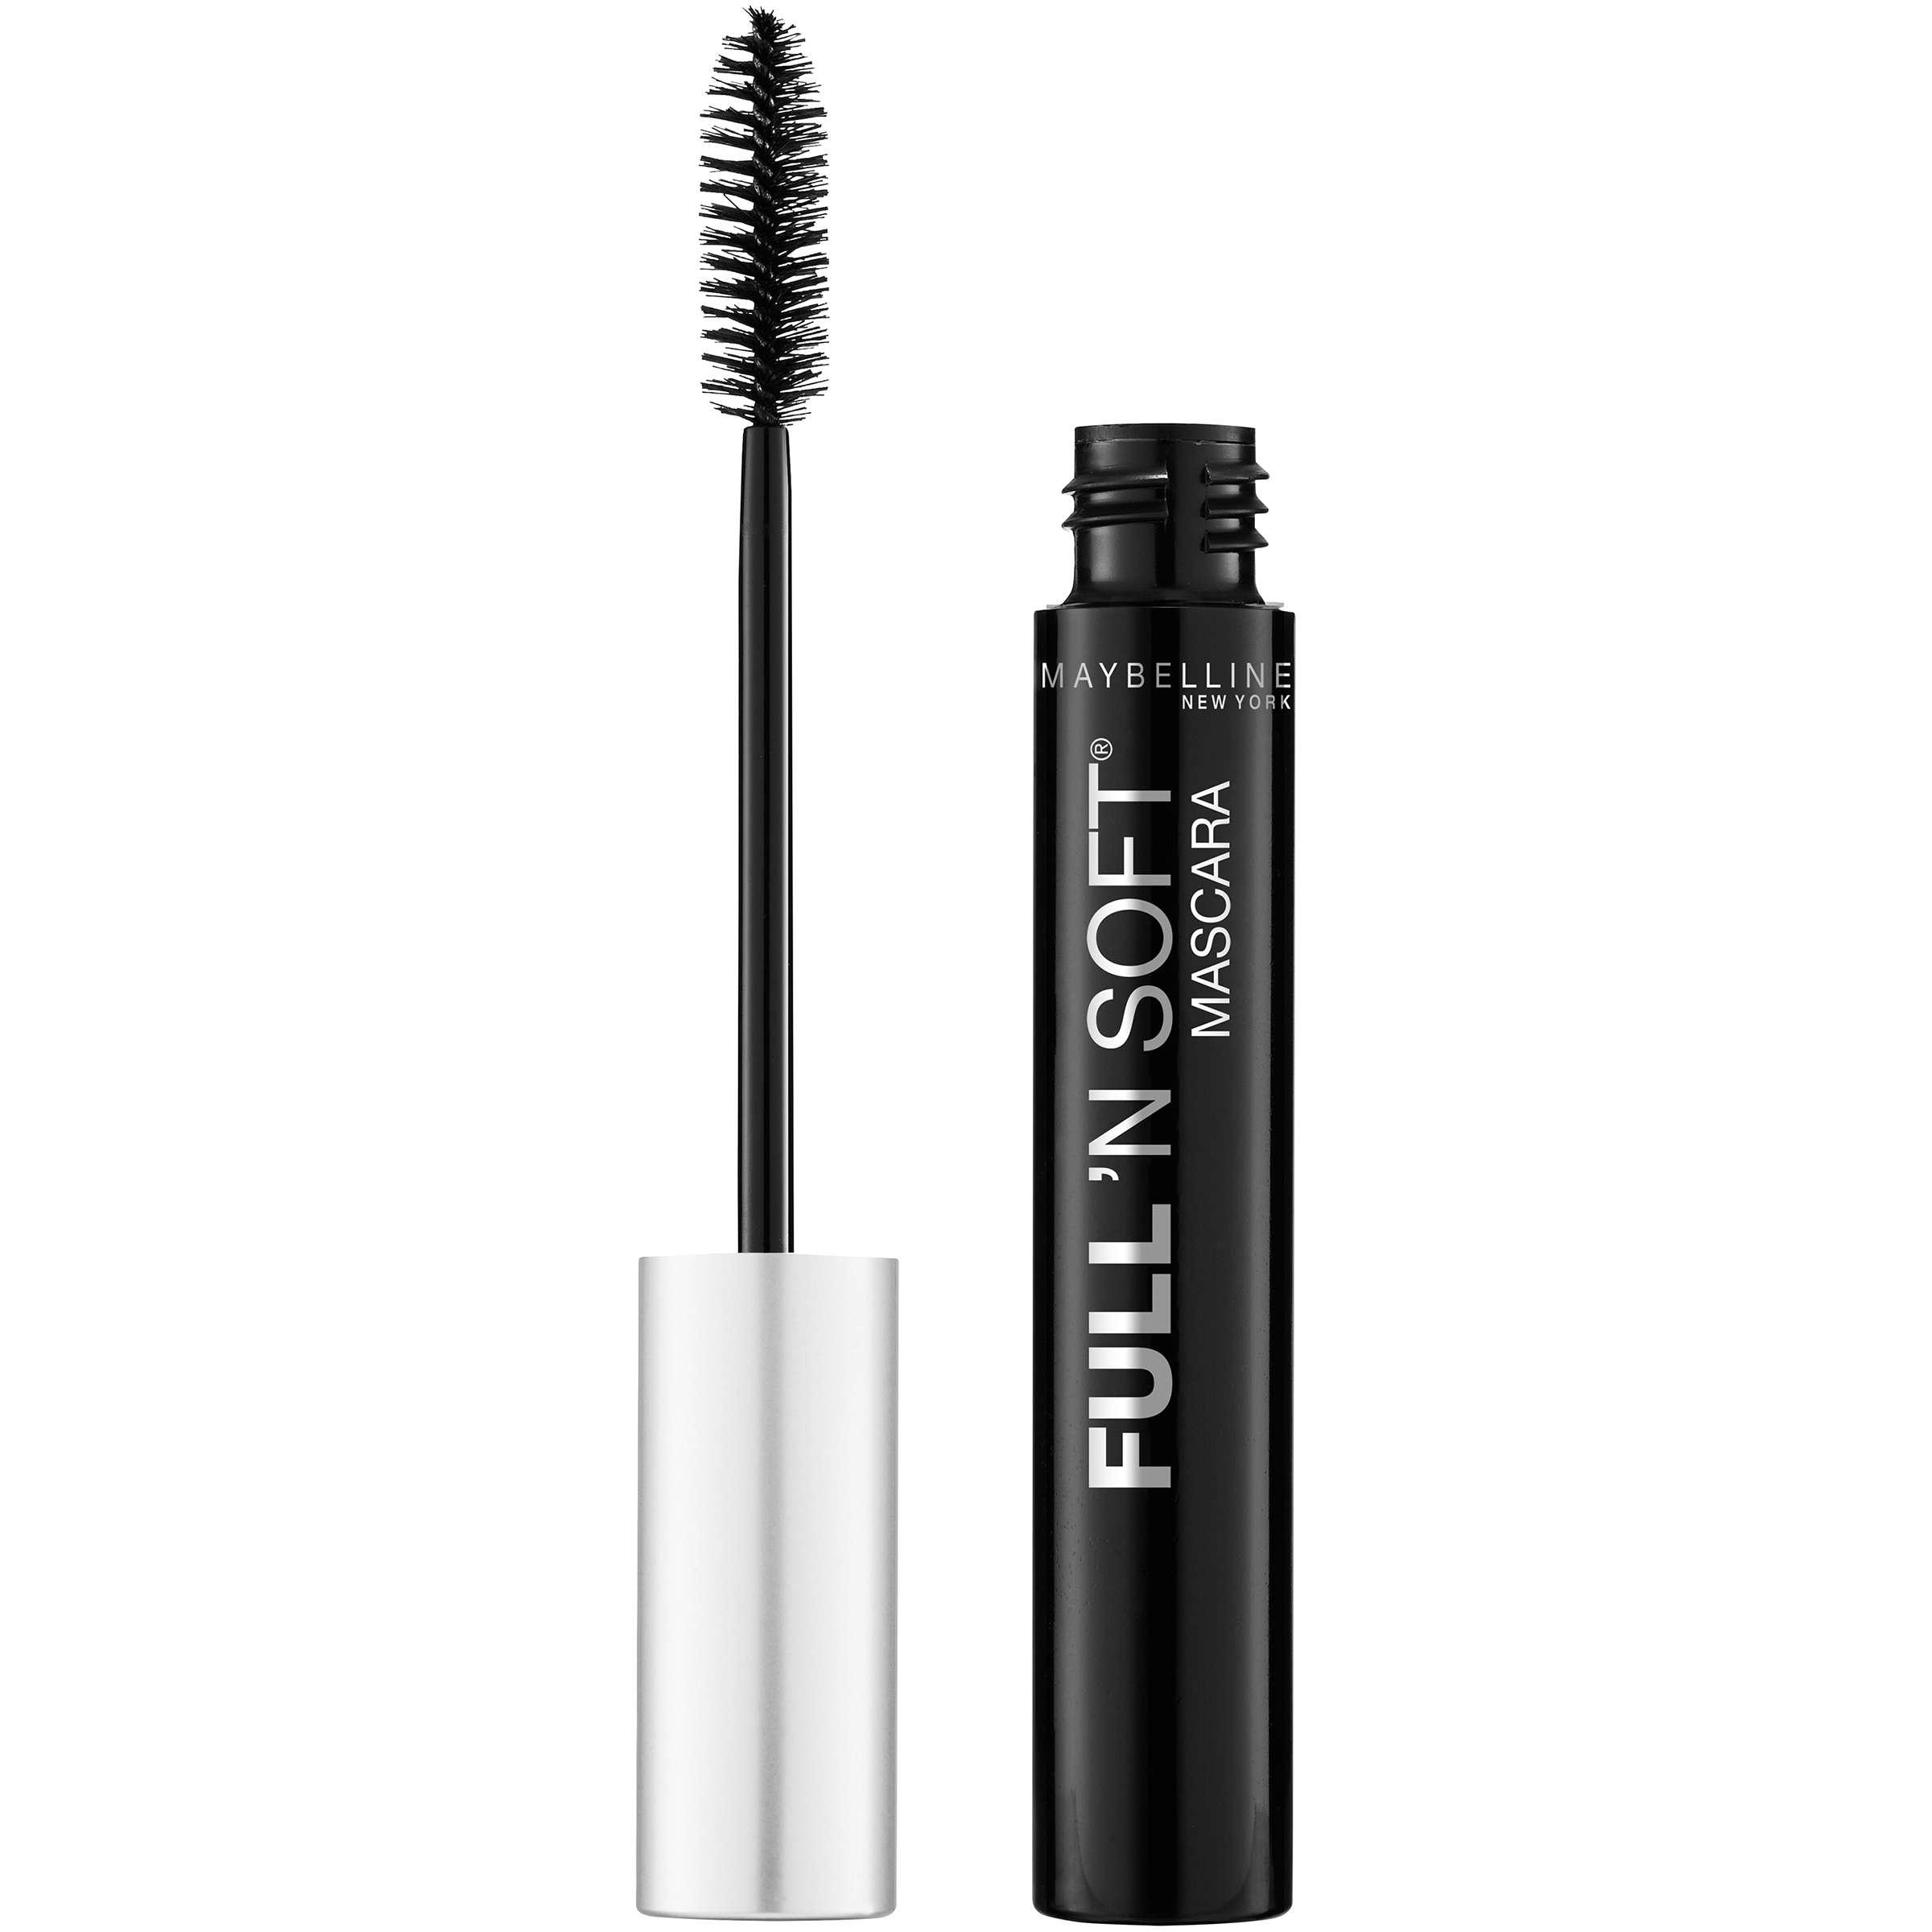 Maybelline New York Full 'N Soft Washable Mascara, Very Black, 0.28 Fl Oz